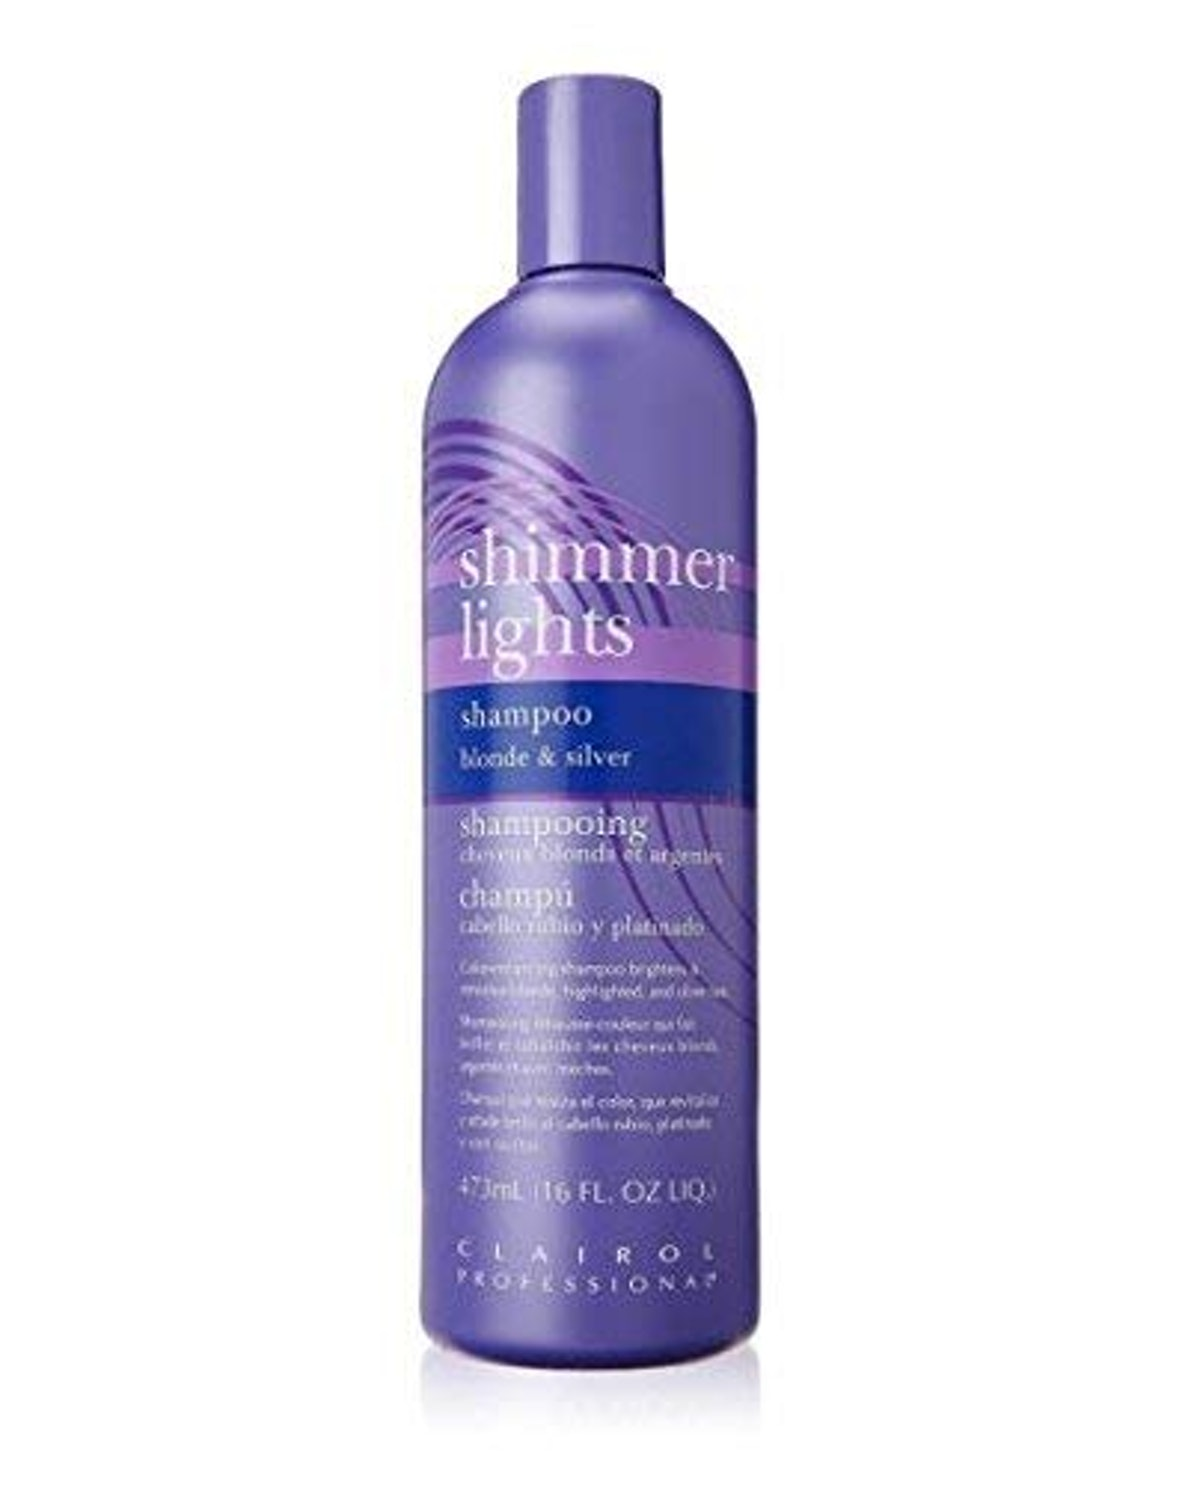 Clairol Professional Shimmer Lights Shampoo Blonde & Silver (16 oz)